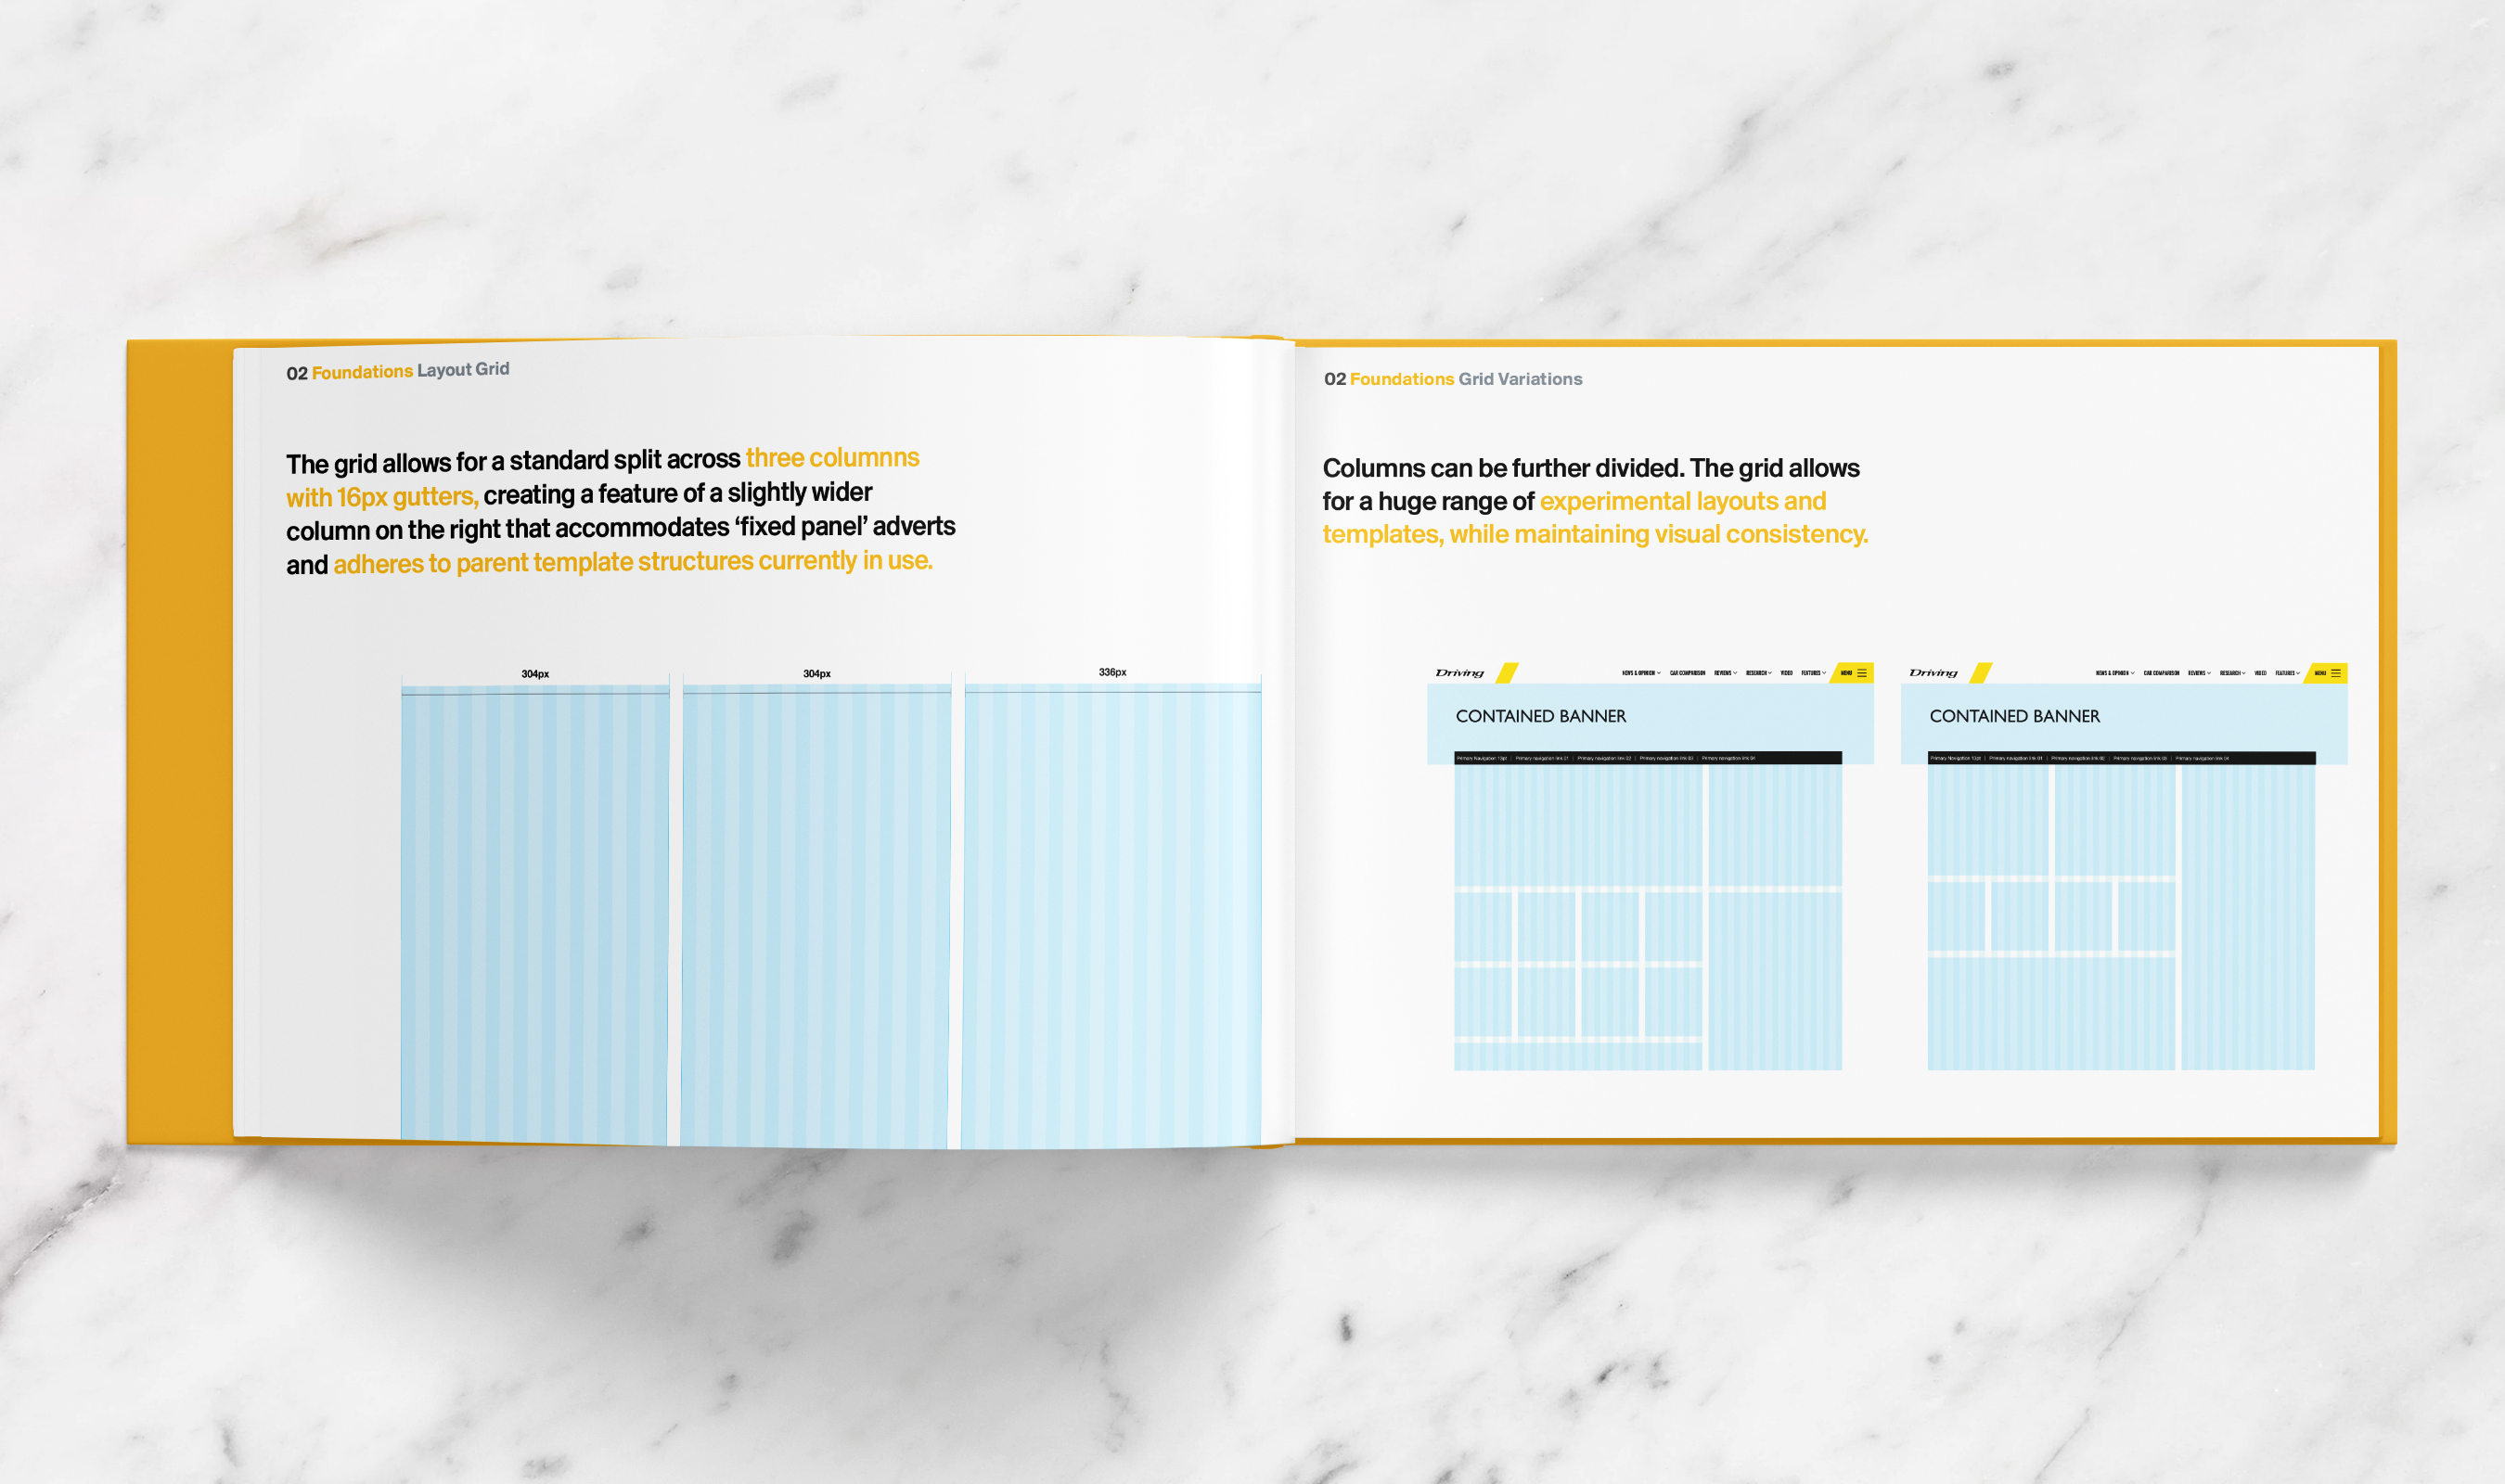 Brand Standards Grids